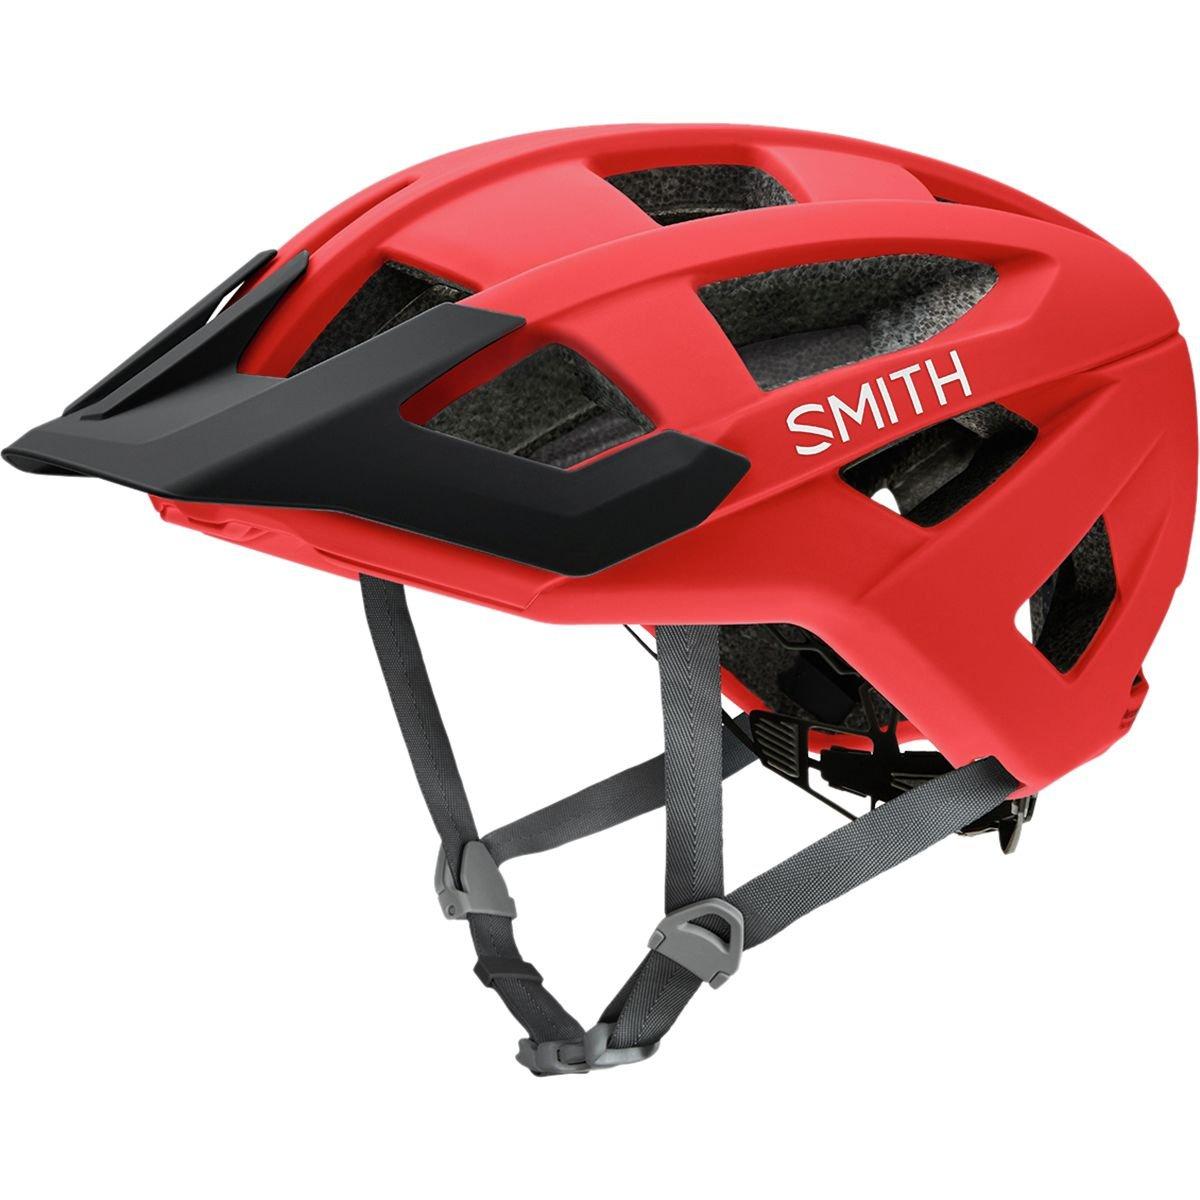 Smith Optics Venture MIPS Adult MTB Cycling Helmet - Matte Rise Large by Smith Optics